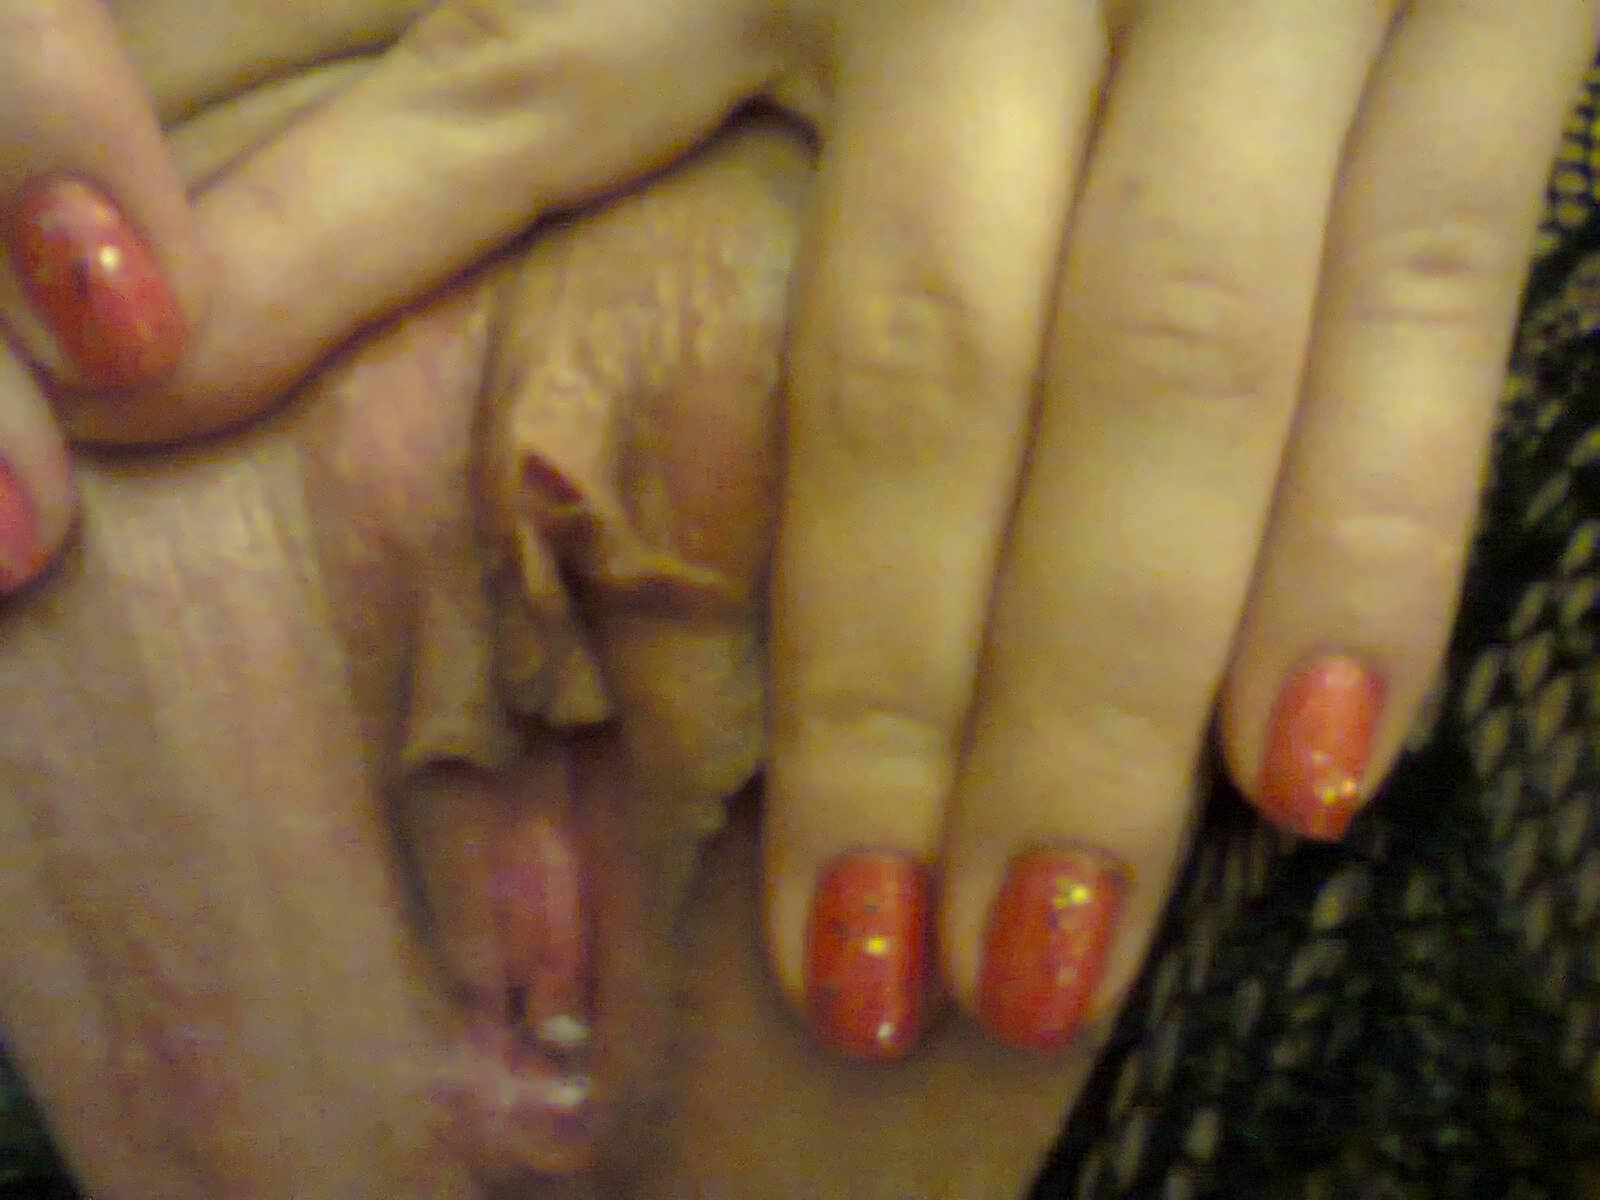 любительница жесткого секса фото